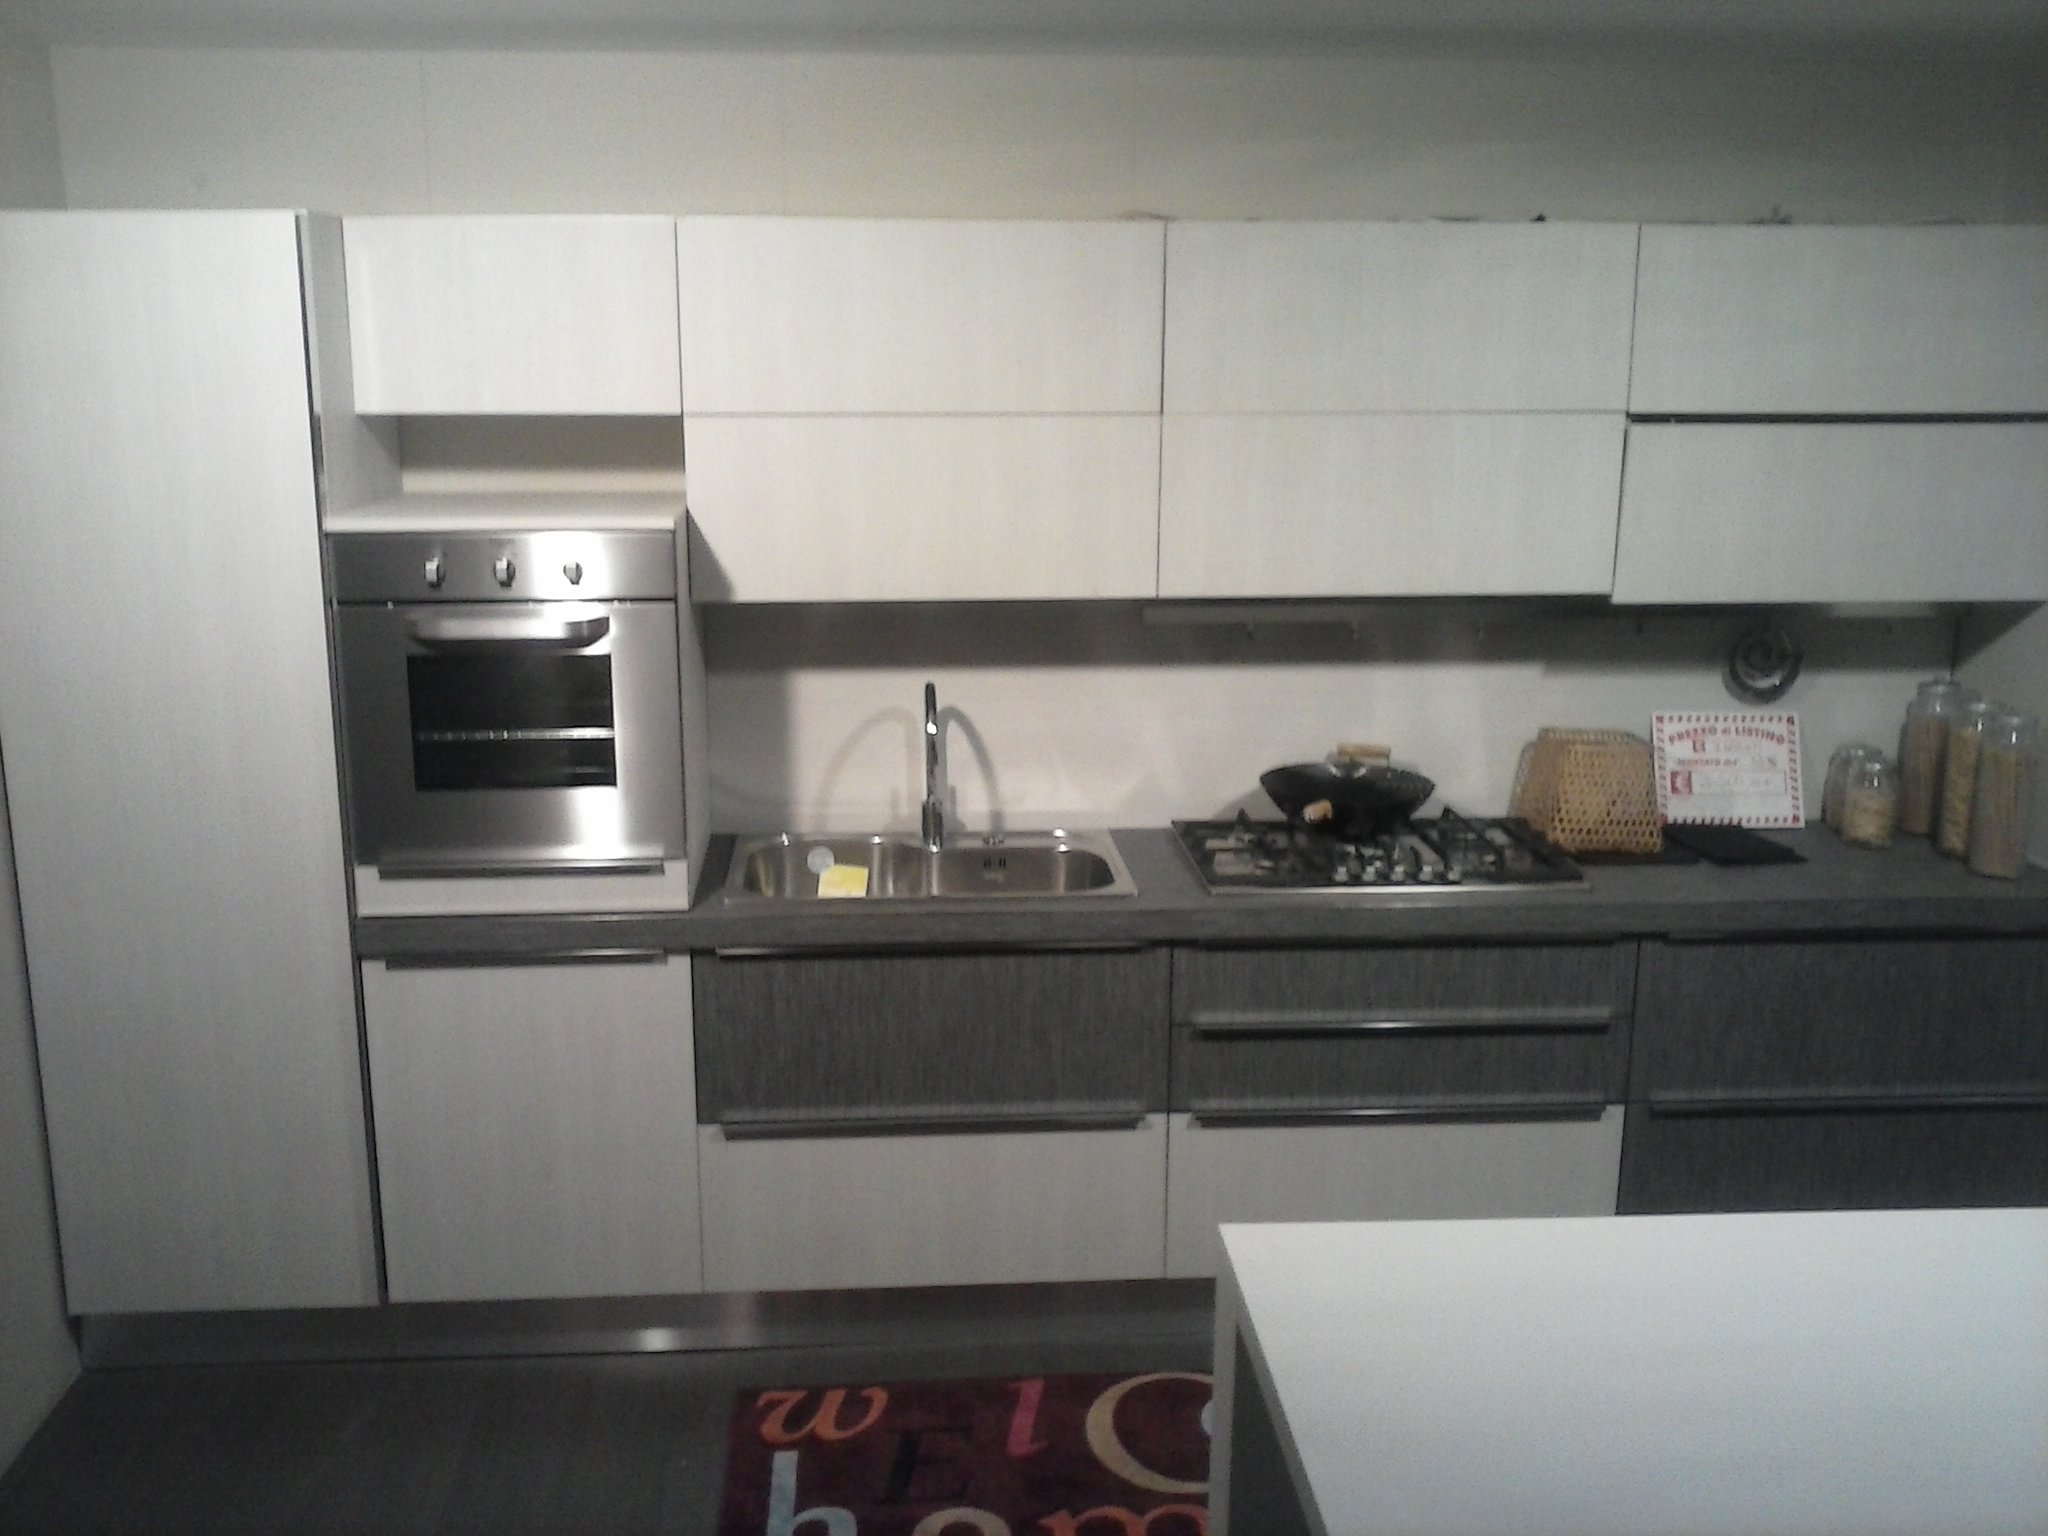 Aran Cucine Forum - Idee Per La Casa - Syafir.com